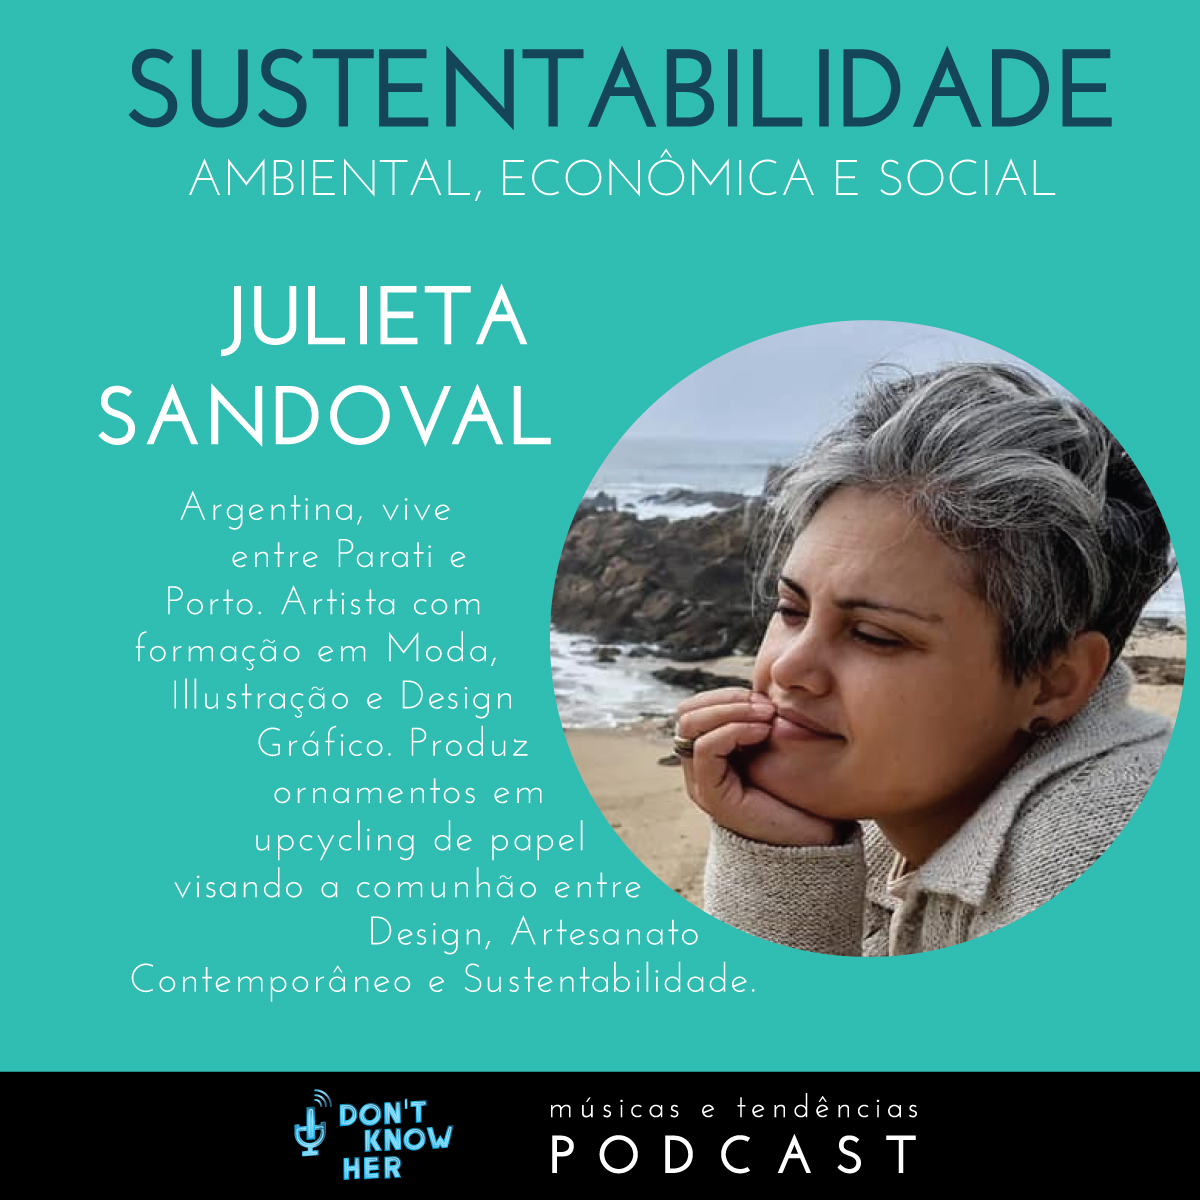 Vem ouvir! https://idkh.home.blog/  #sustentabilidade #socioambiental #maisamor #ameanatureza #salveanatureza #sustentabilidadecriativa #sustentabilidadebrasil #meioambiente #sustentável #podcastbrasil #podcastpt #podcastbr #podcastportugal #batepapo #podosferapic.twitter.com/NmYmiLrww7